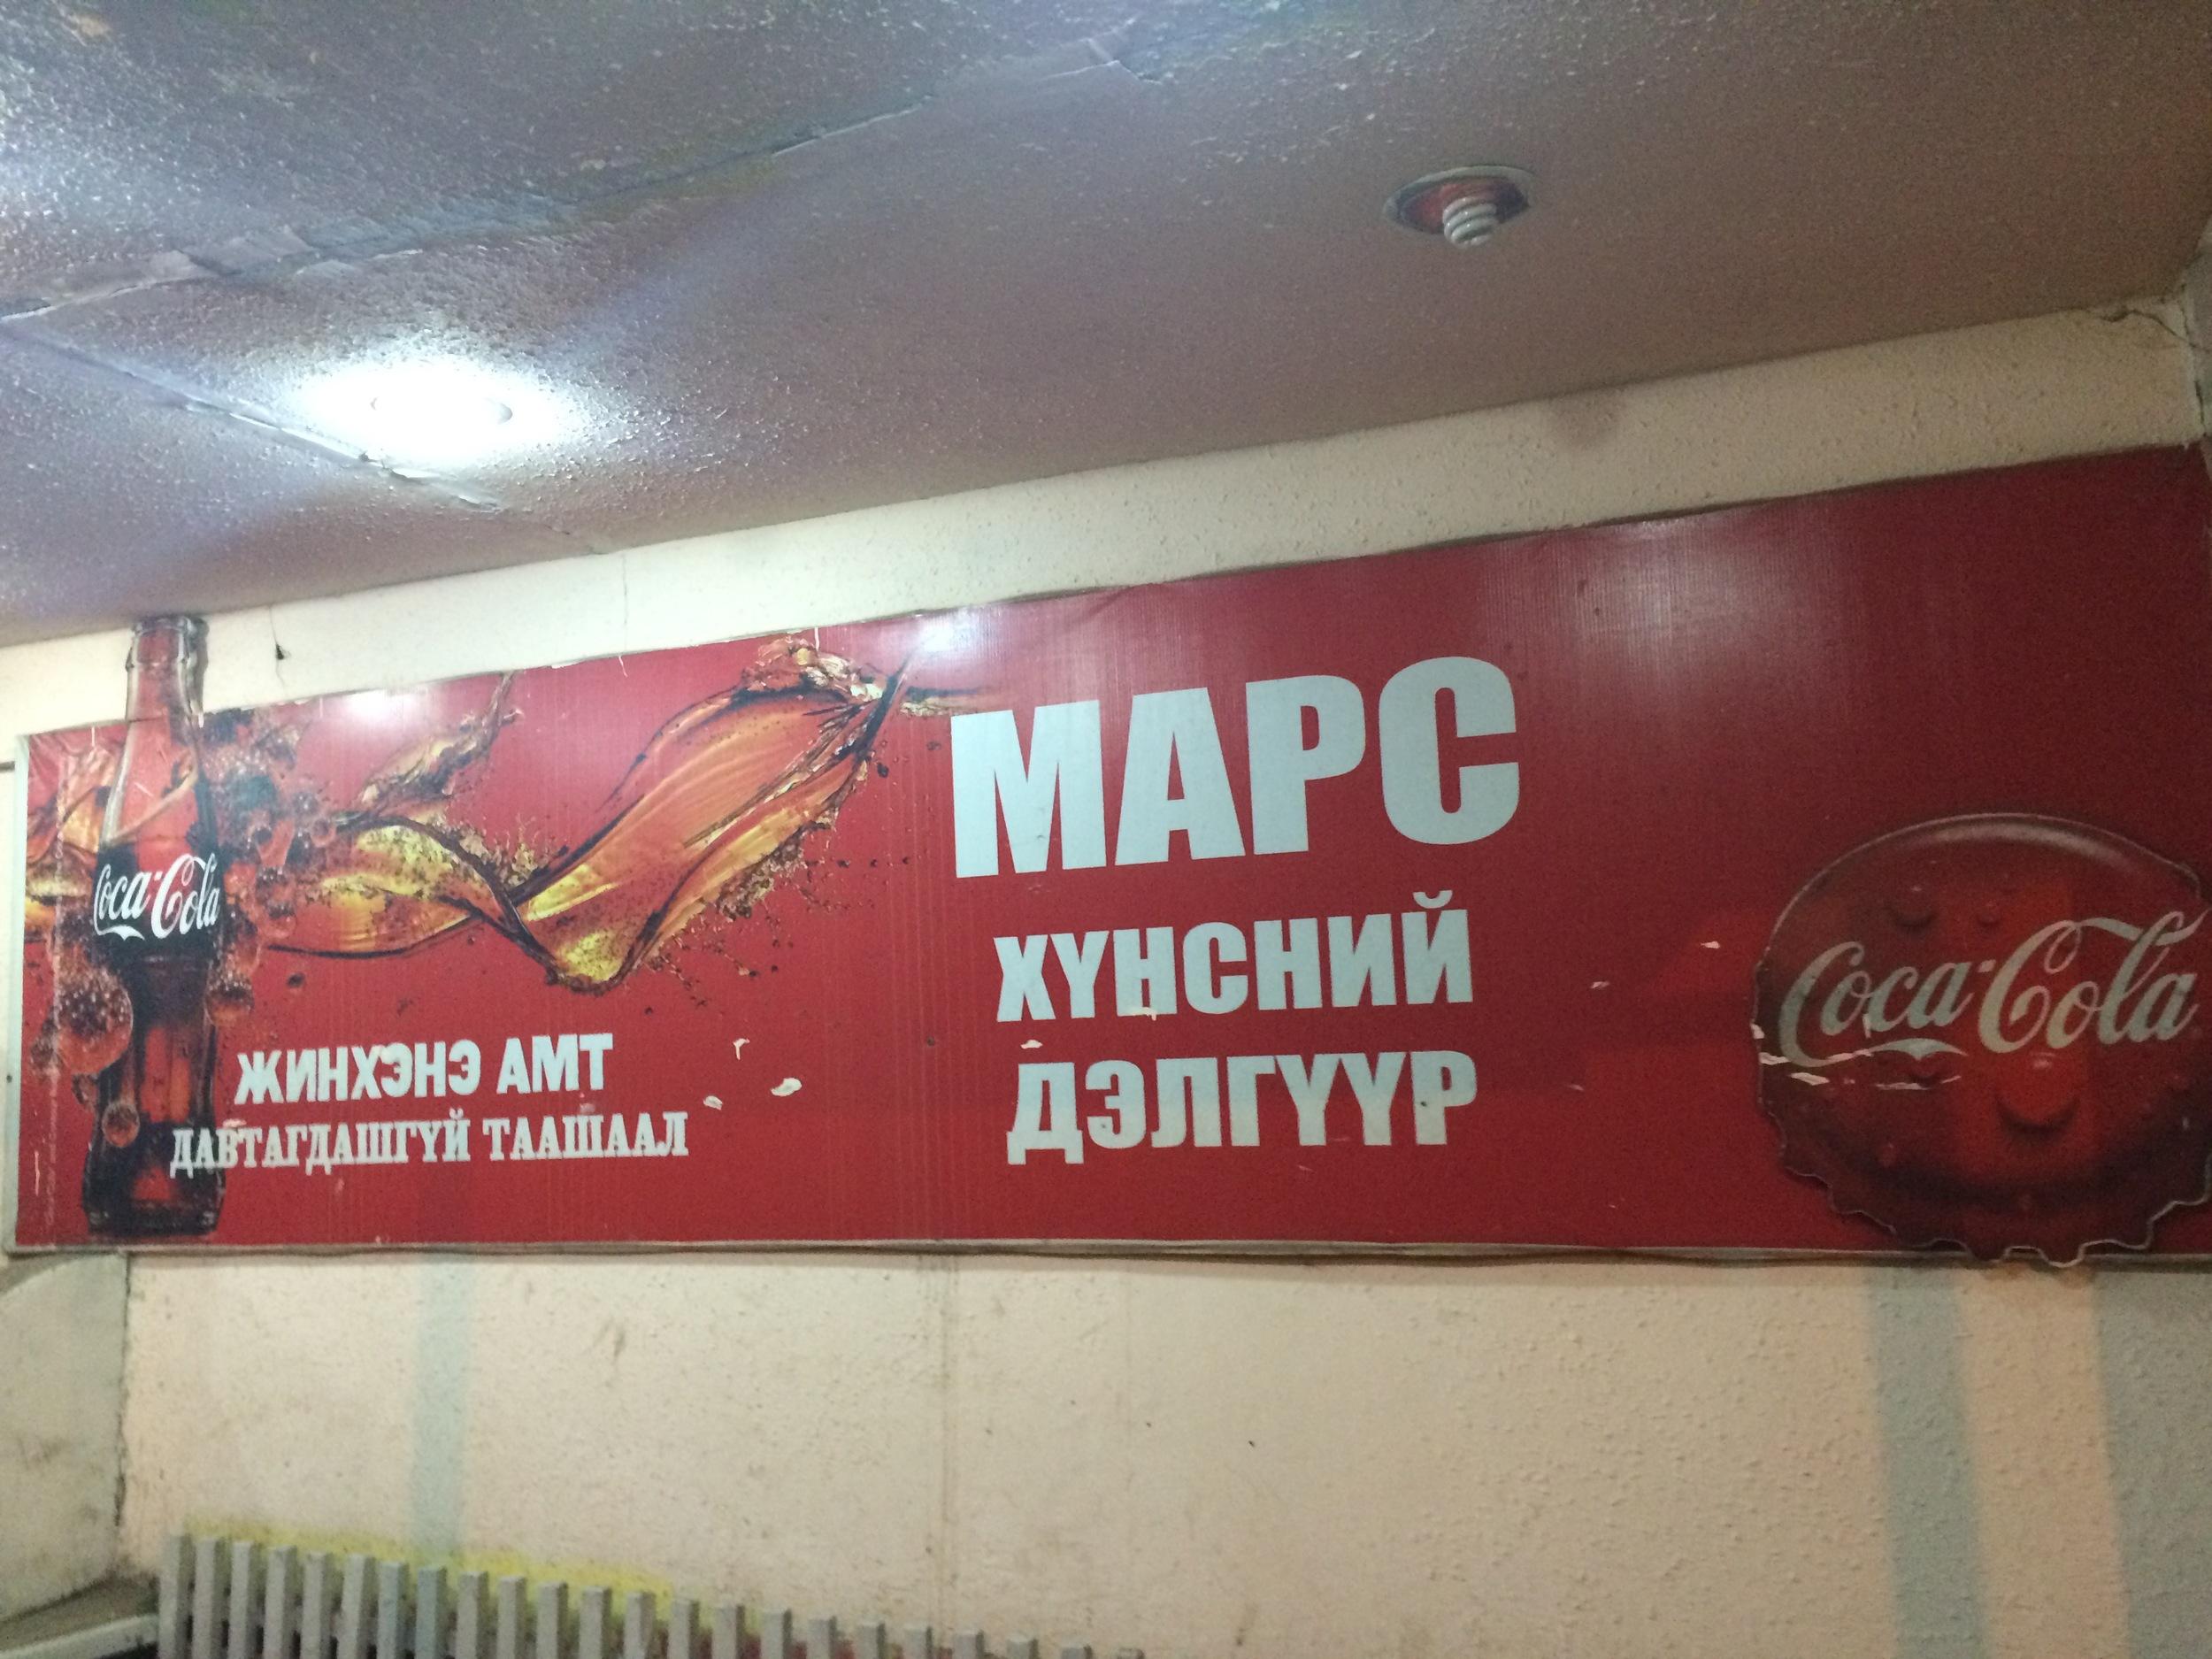 Coco-Cola - the worldwide brand